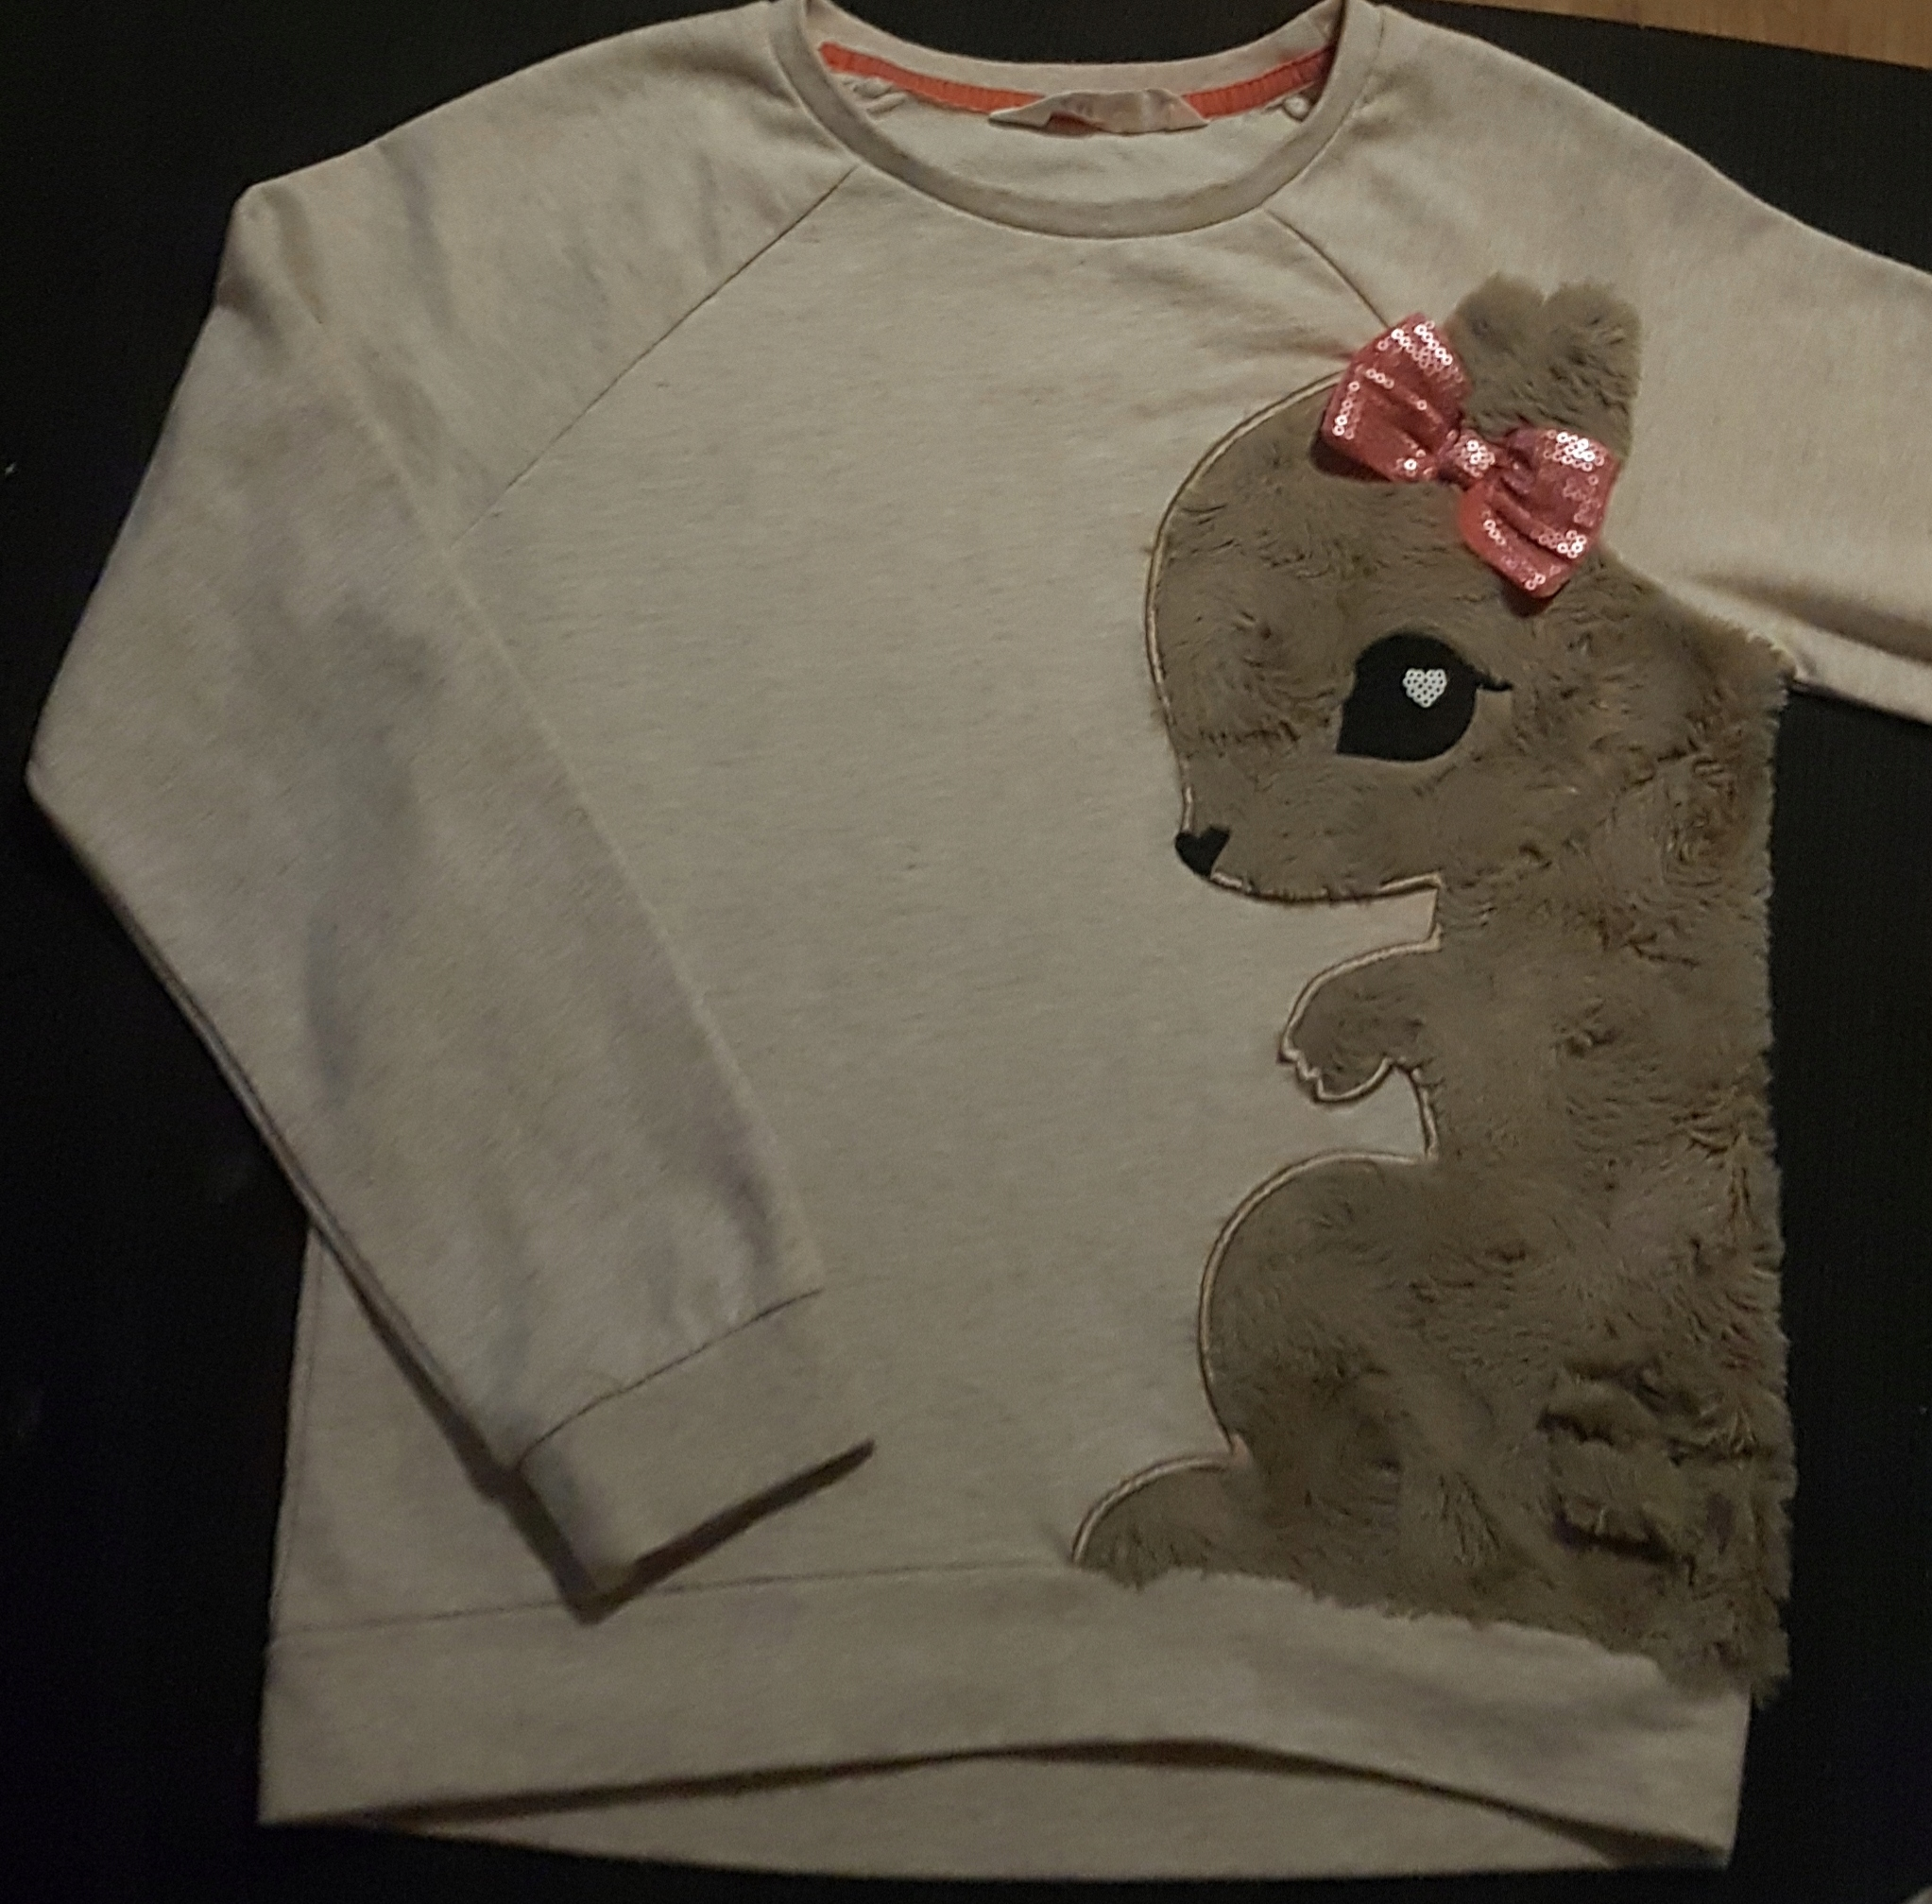 Bluza H&M 134cm 9lat piekna modna kokarda